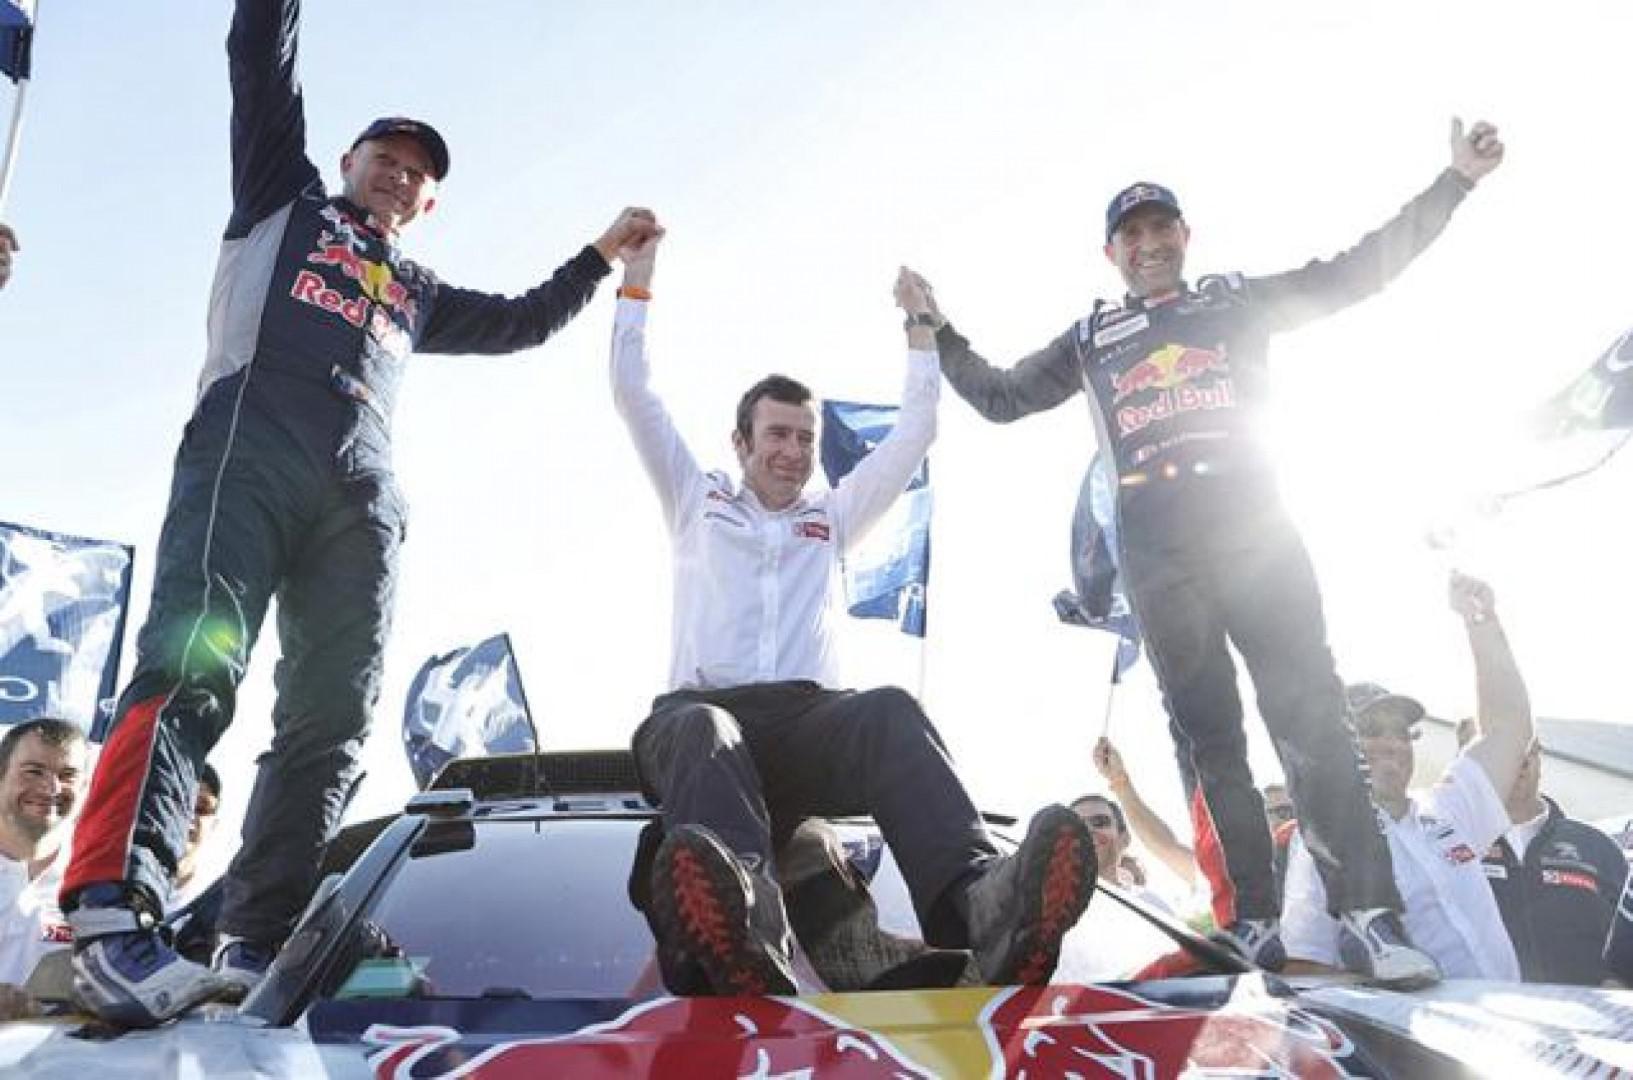 Peterhensel(auto) et Sunderland(moto) vainqueurs du Dakar 2017